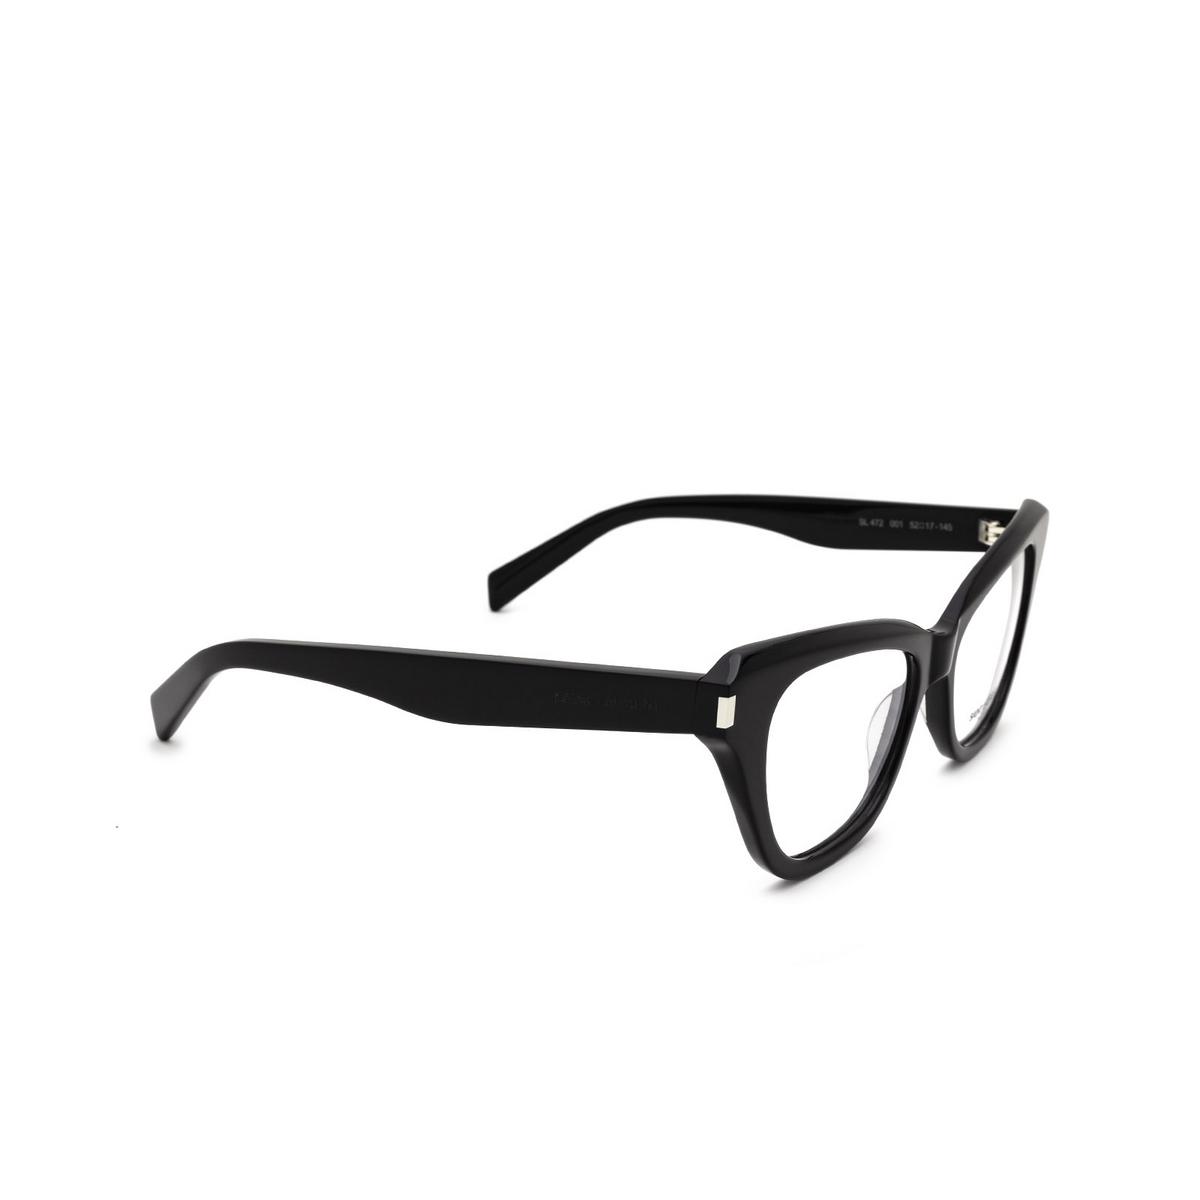 Saint Laurent® Cat-eye Eyeglasses: SL 472 color Black 001 - three-quarters view.